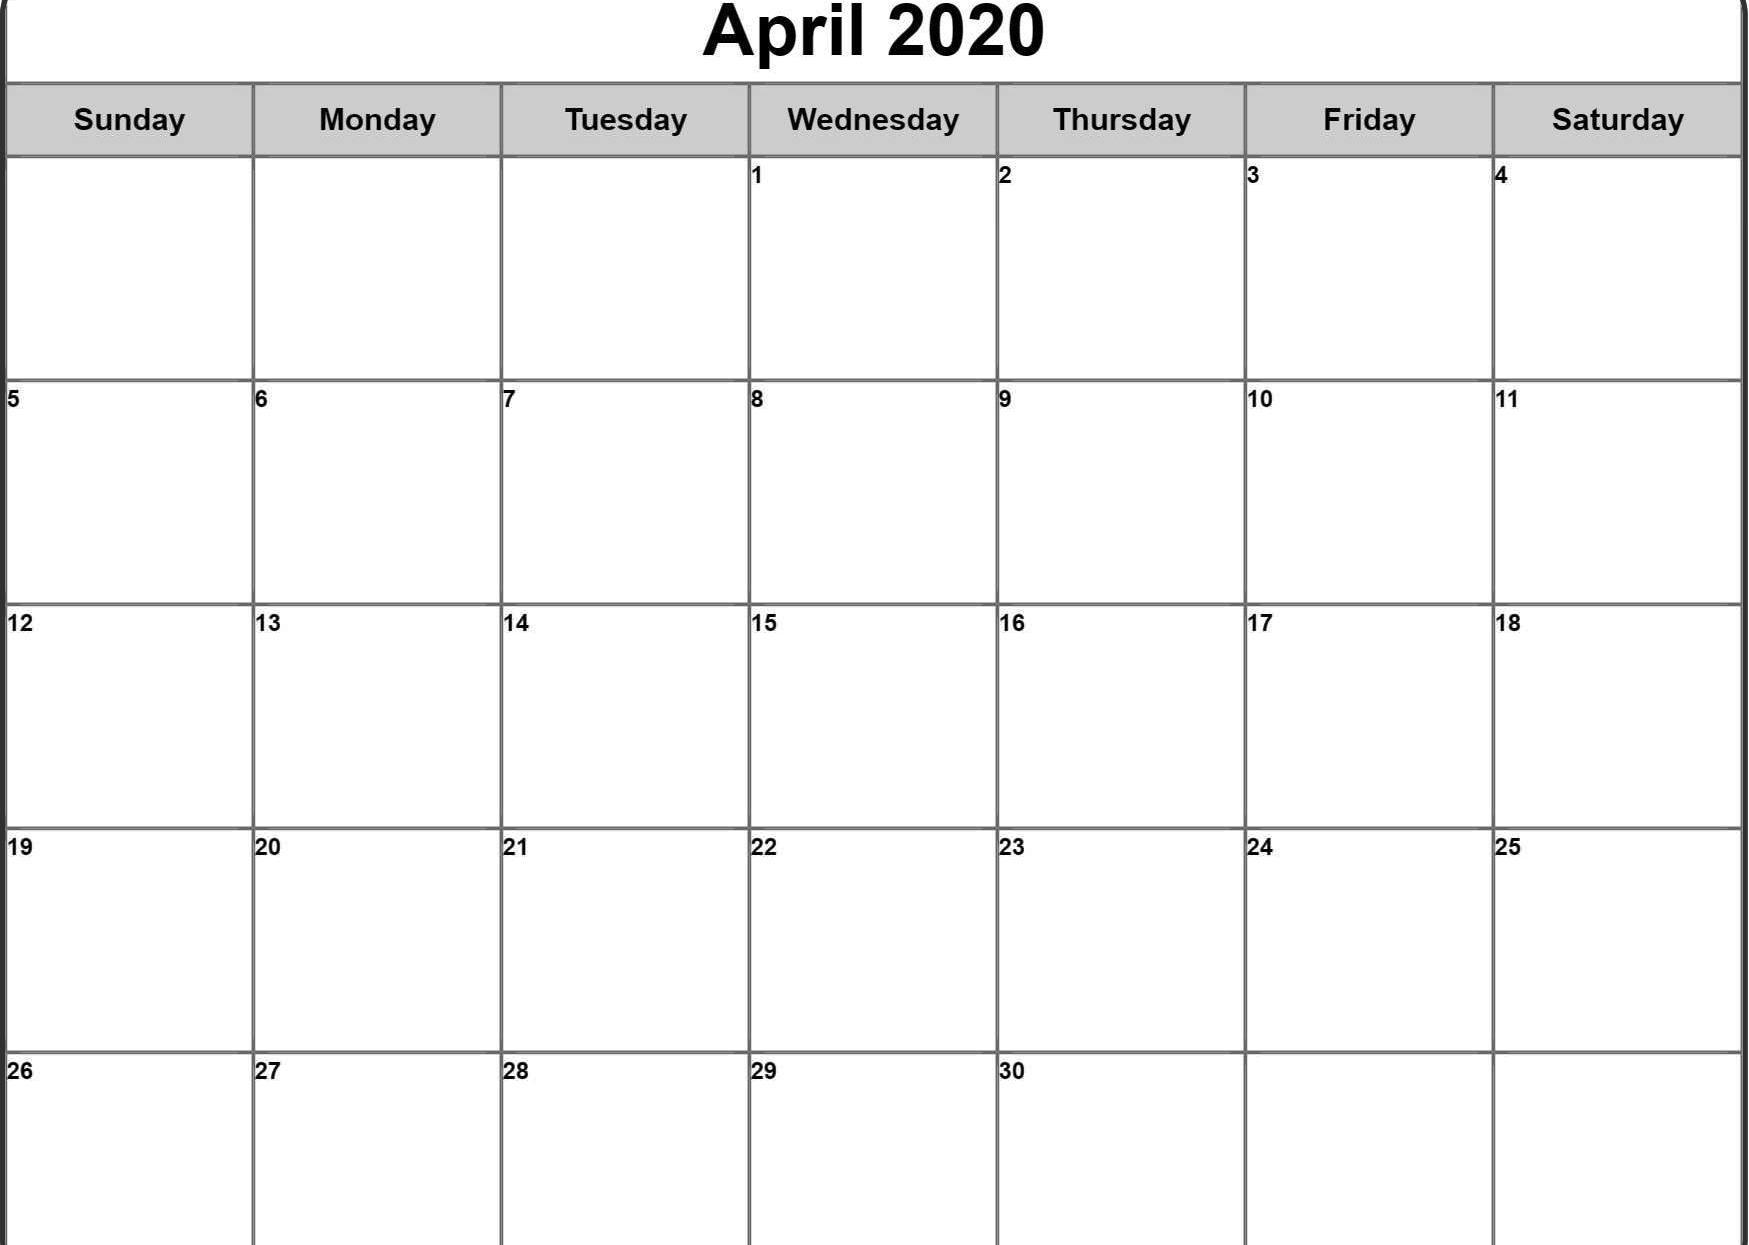 CALENDAR 2020 APRIL - Free Printable Calendars and Planners 2019